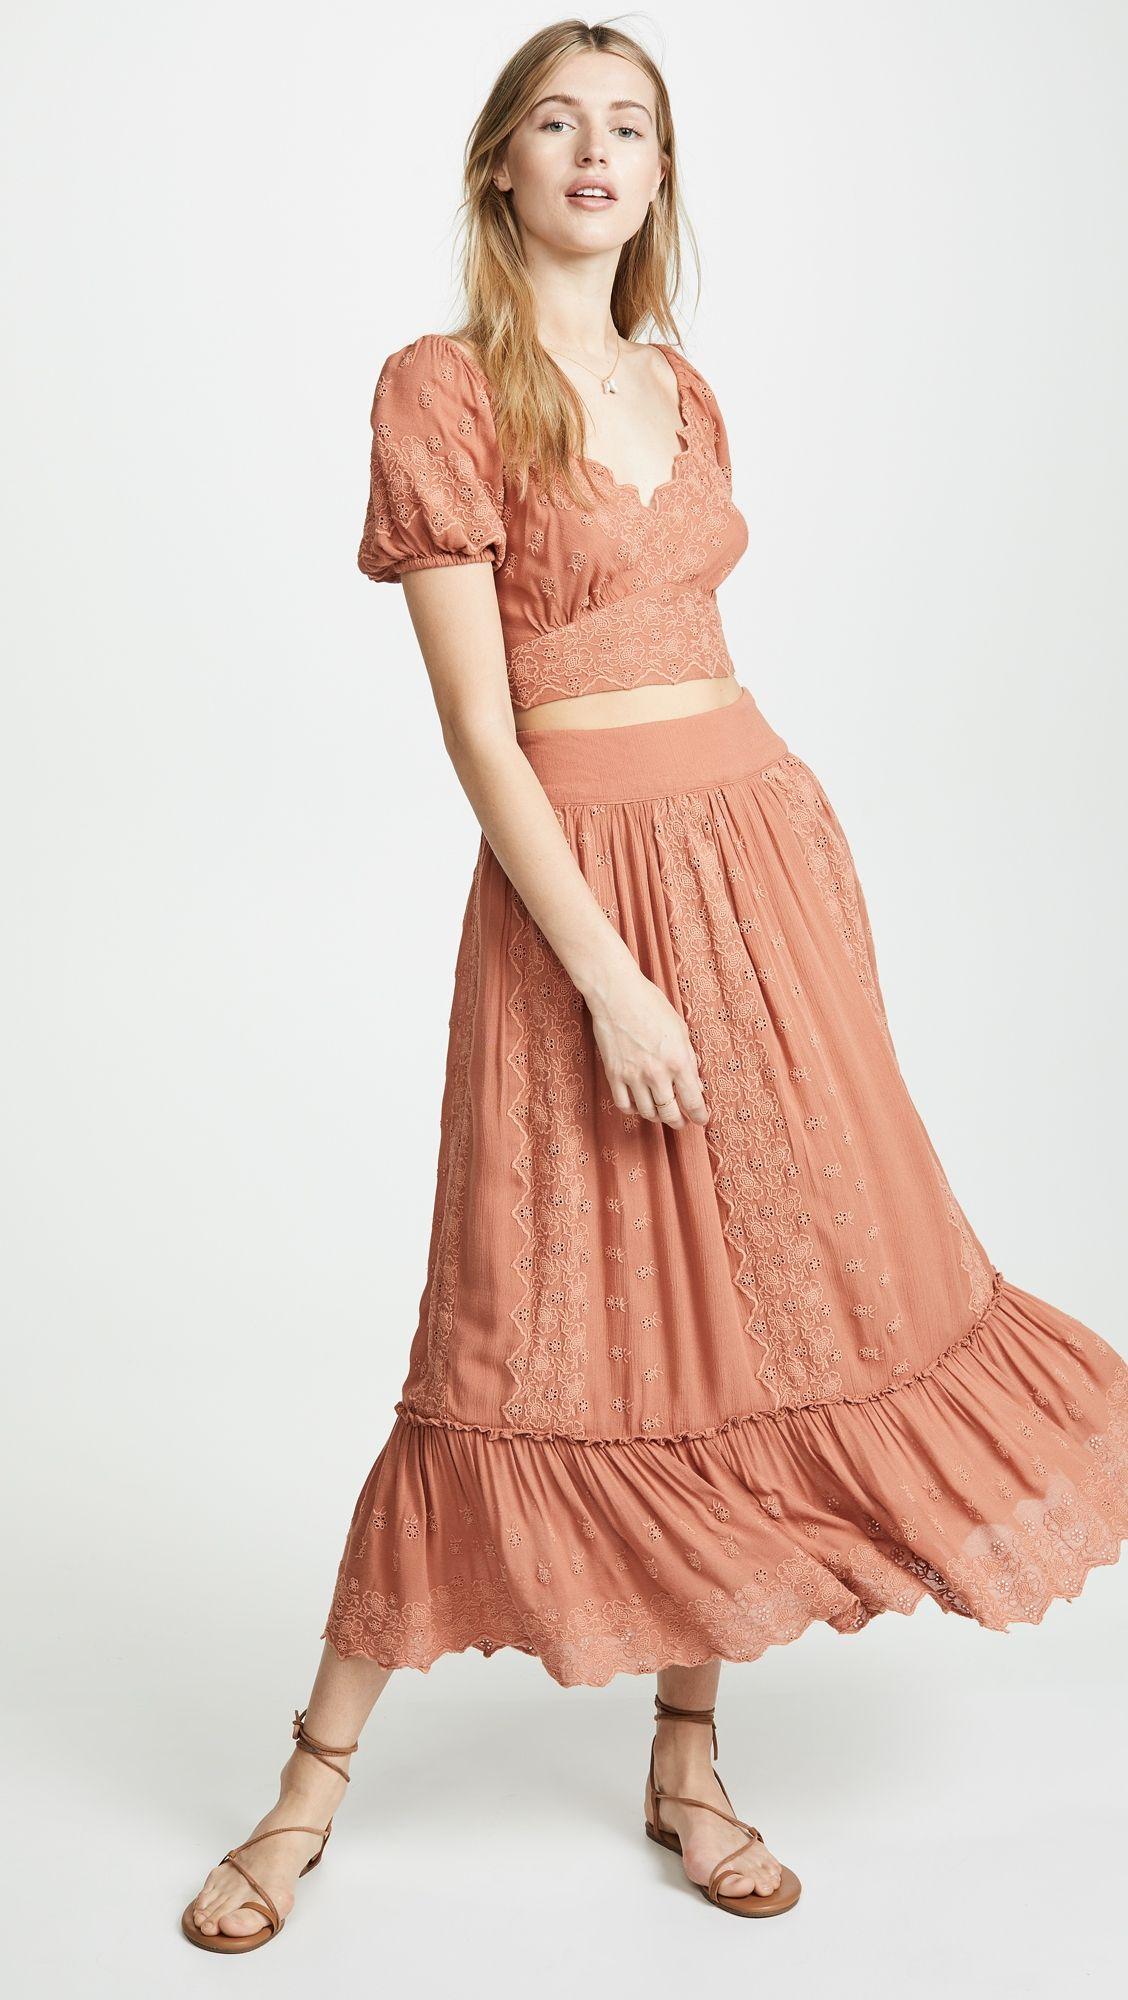 76dd08ff1c3b Free People Ella Shirt & Skirt Set in 2019   Products   Shirt skirt ...